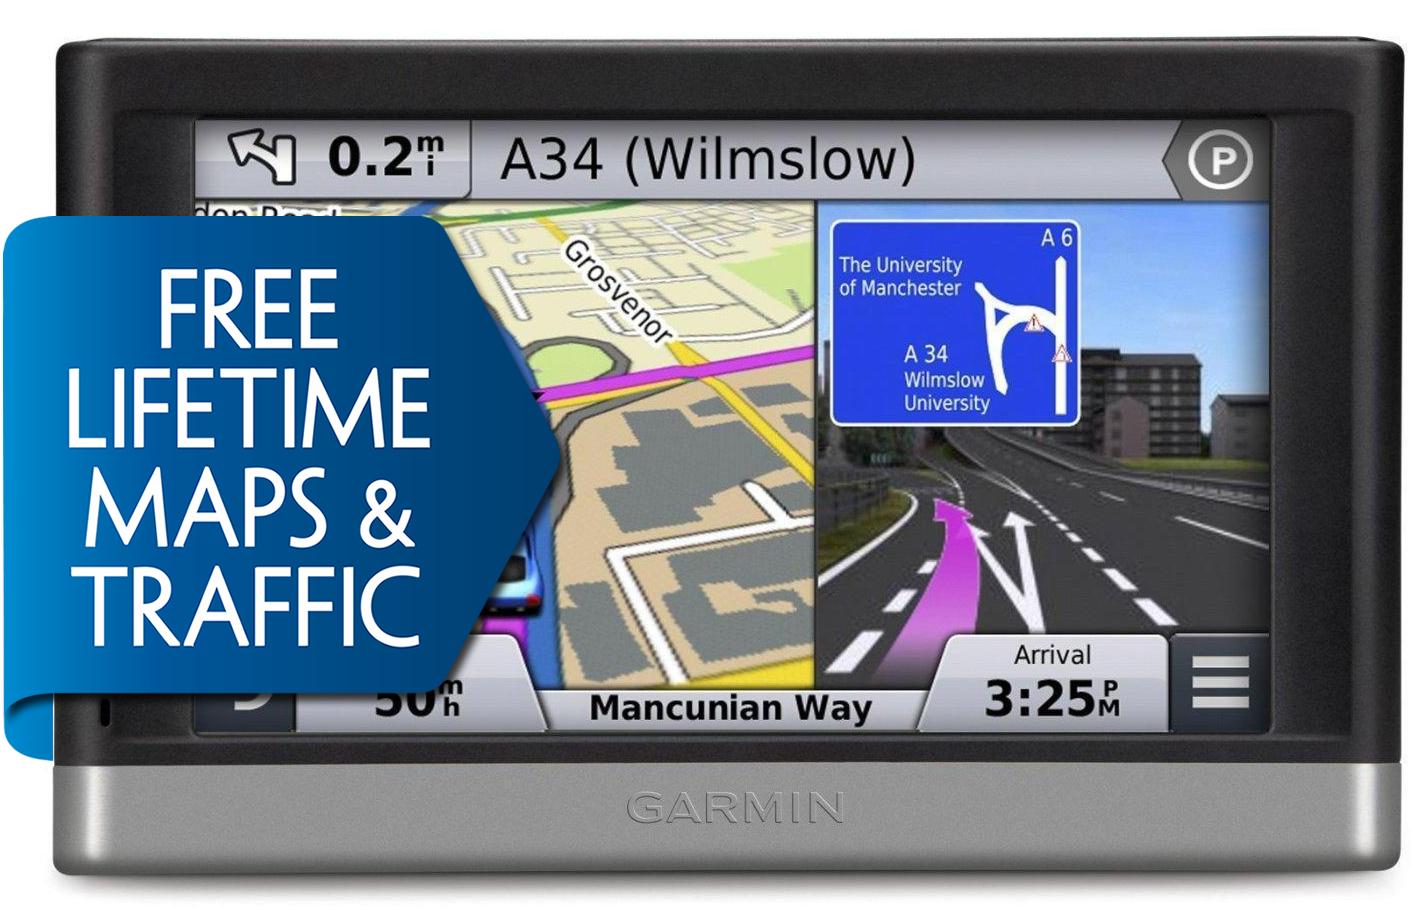 Garmin Nuvi 2597LMT GPS SATNAV UK Europe FREE LIFETIME Maps & Traffic